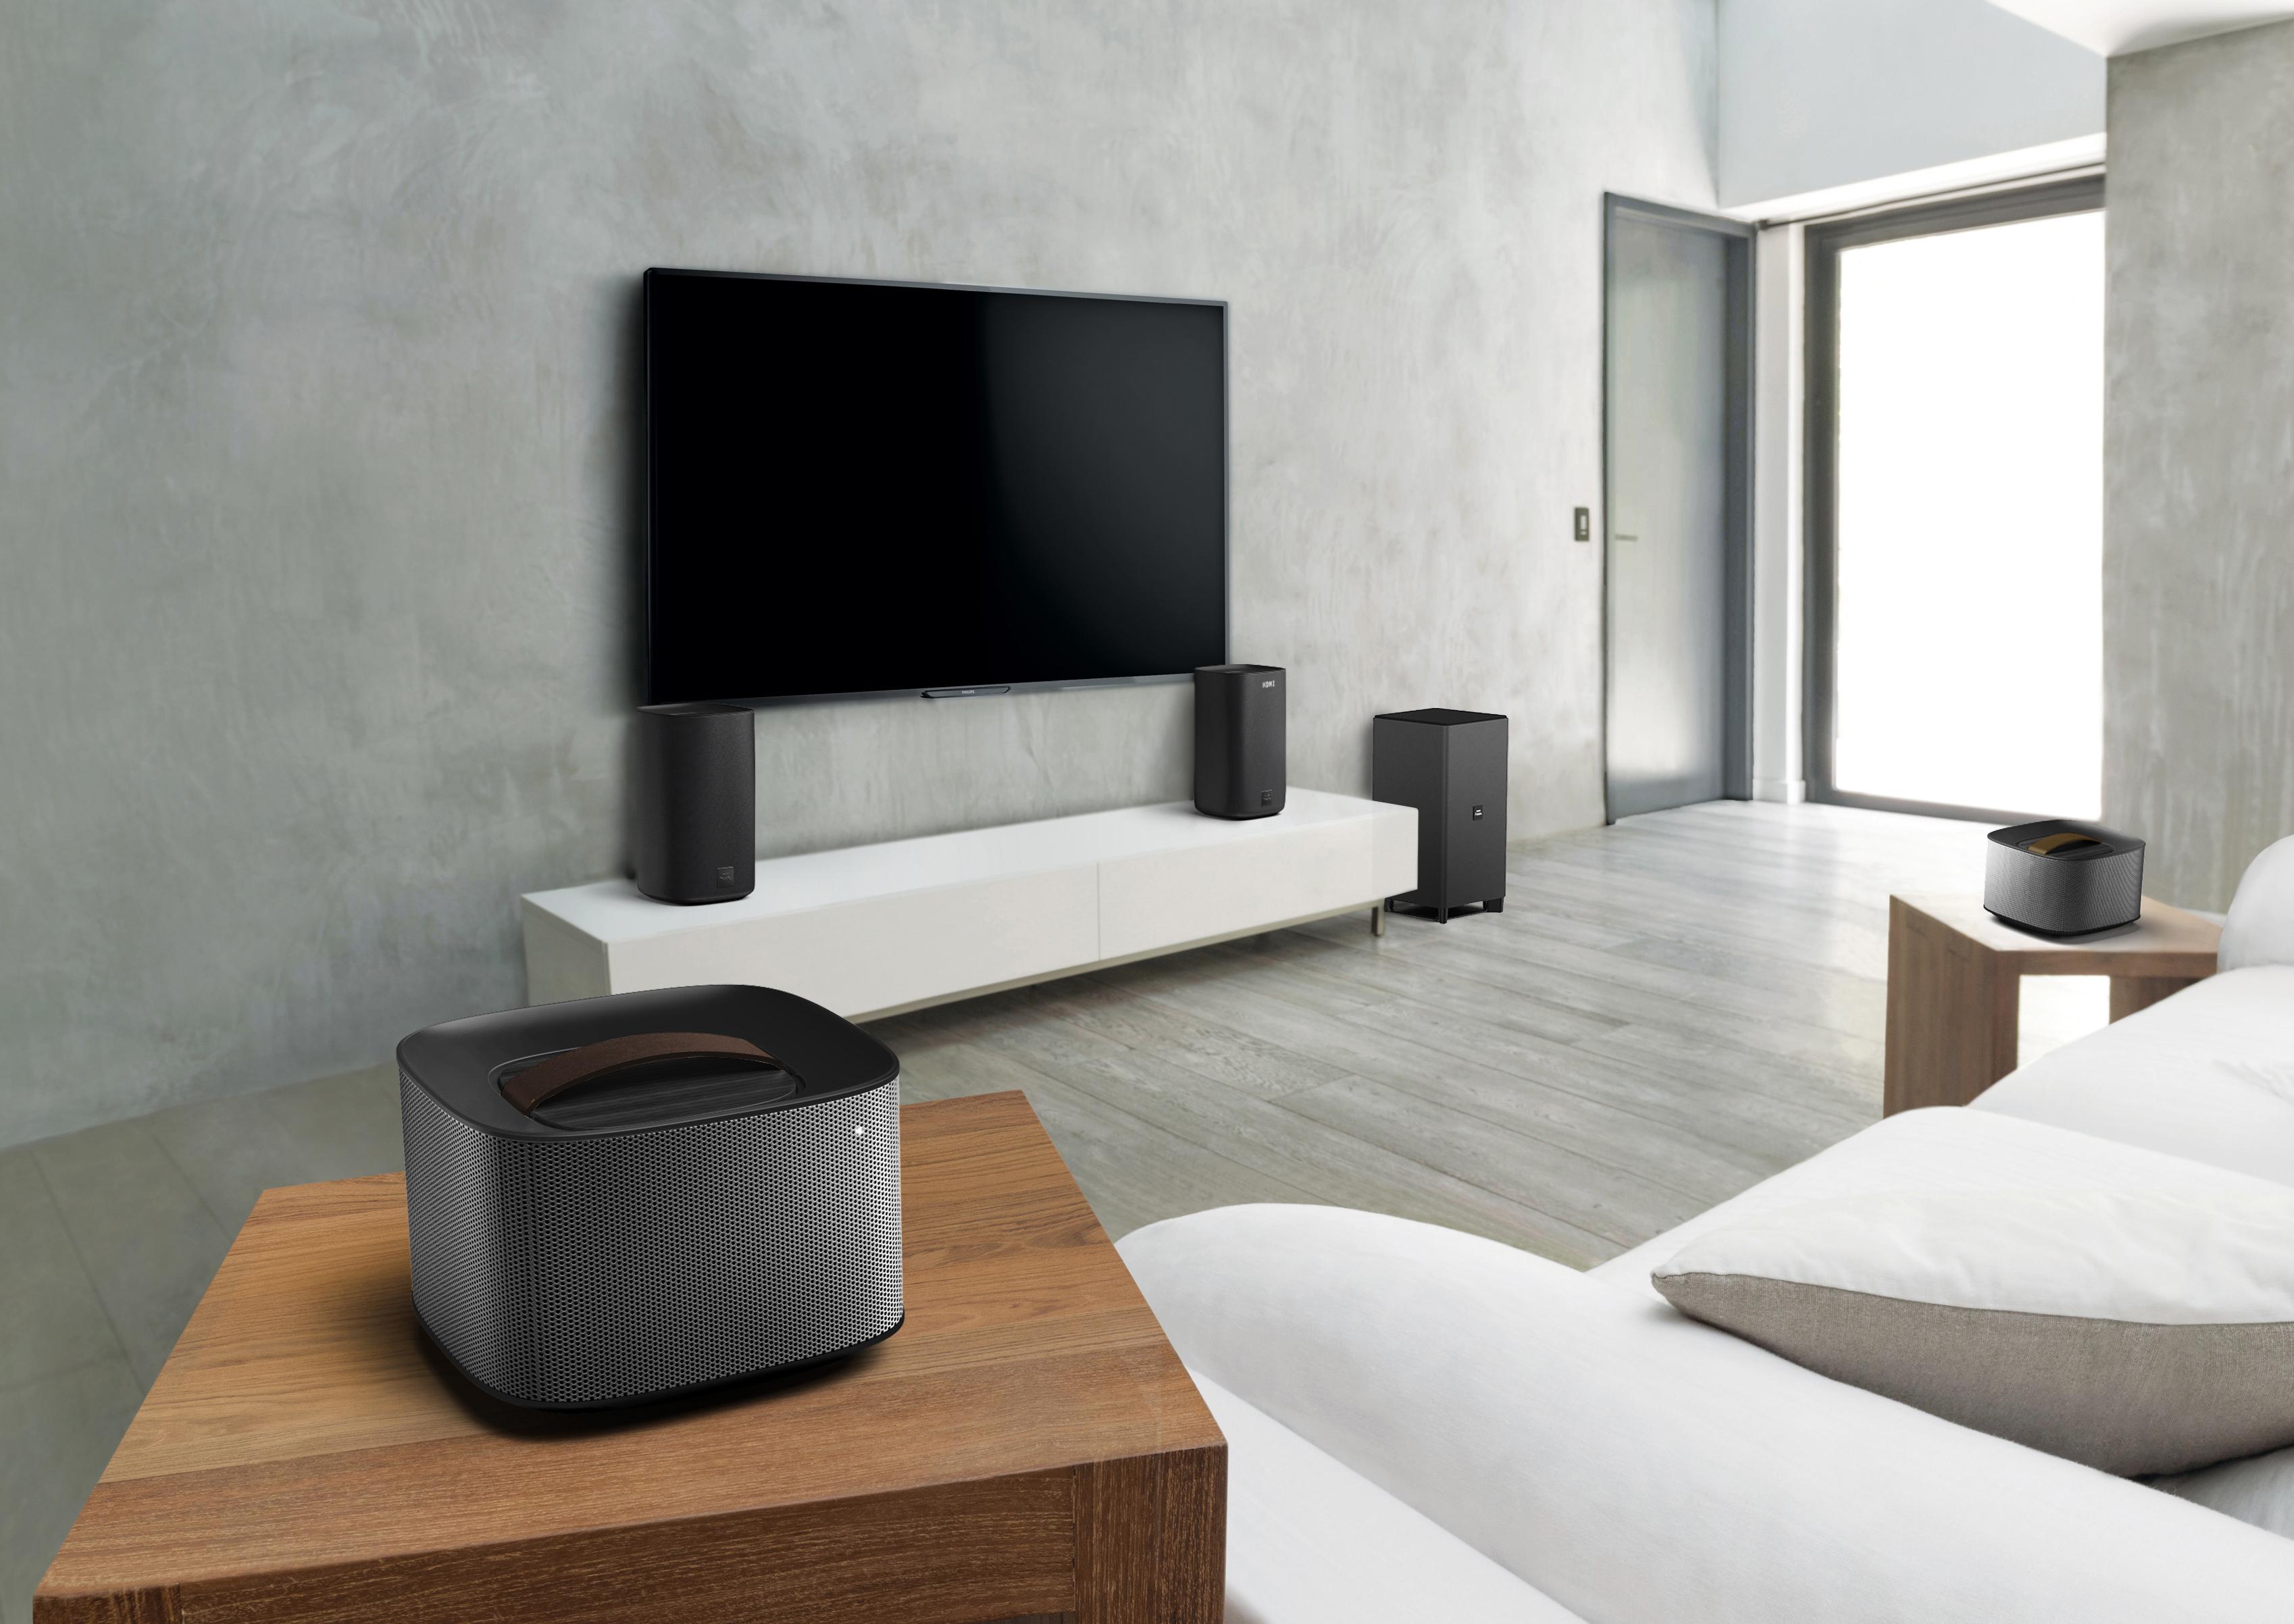 Philips_Fidelio_wireless_surround_cinema_speakers_E6_image2